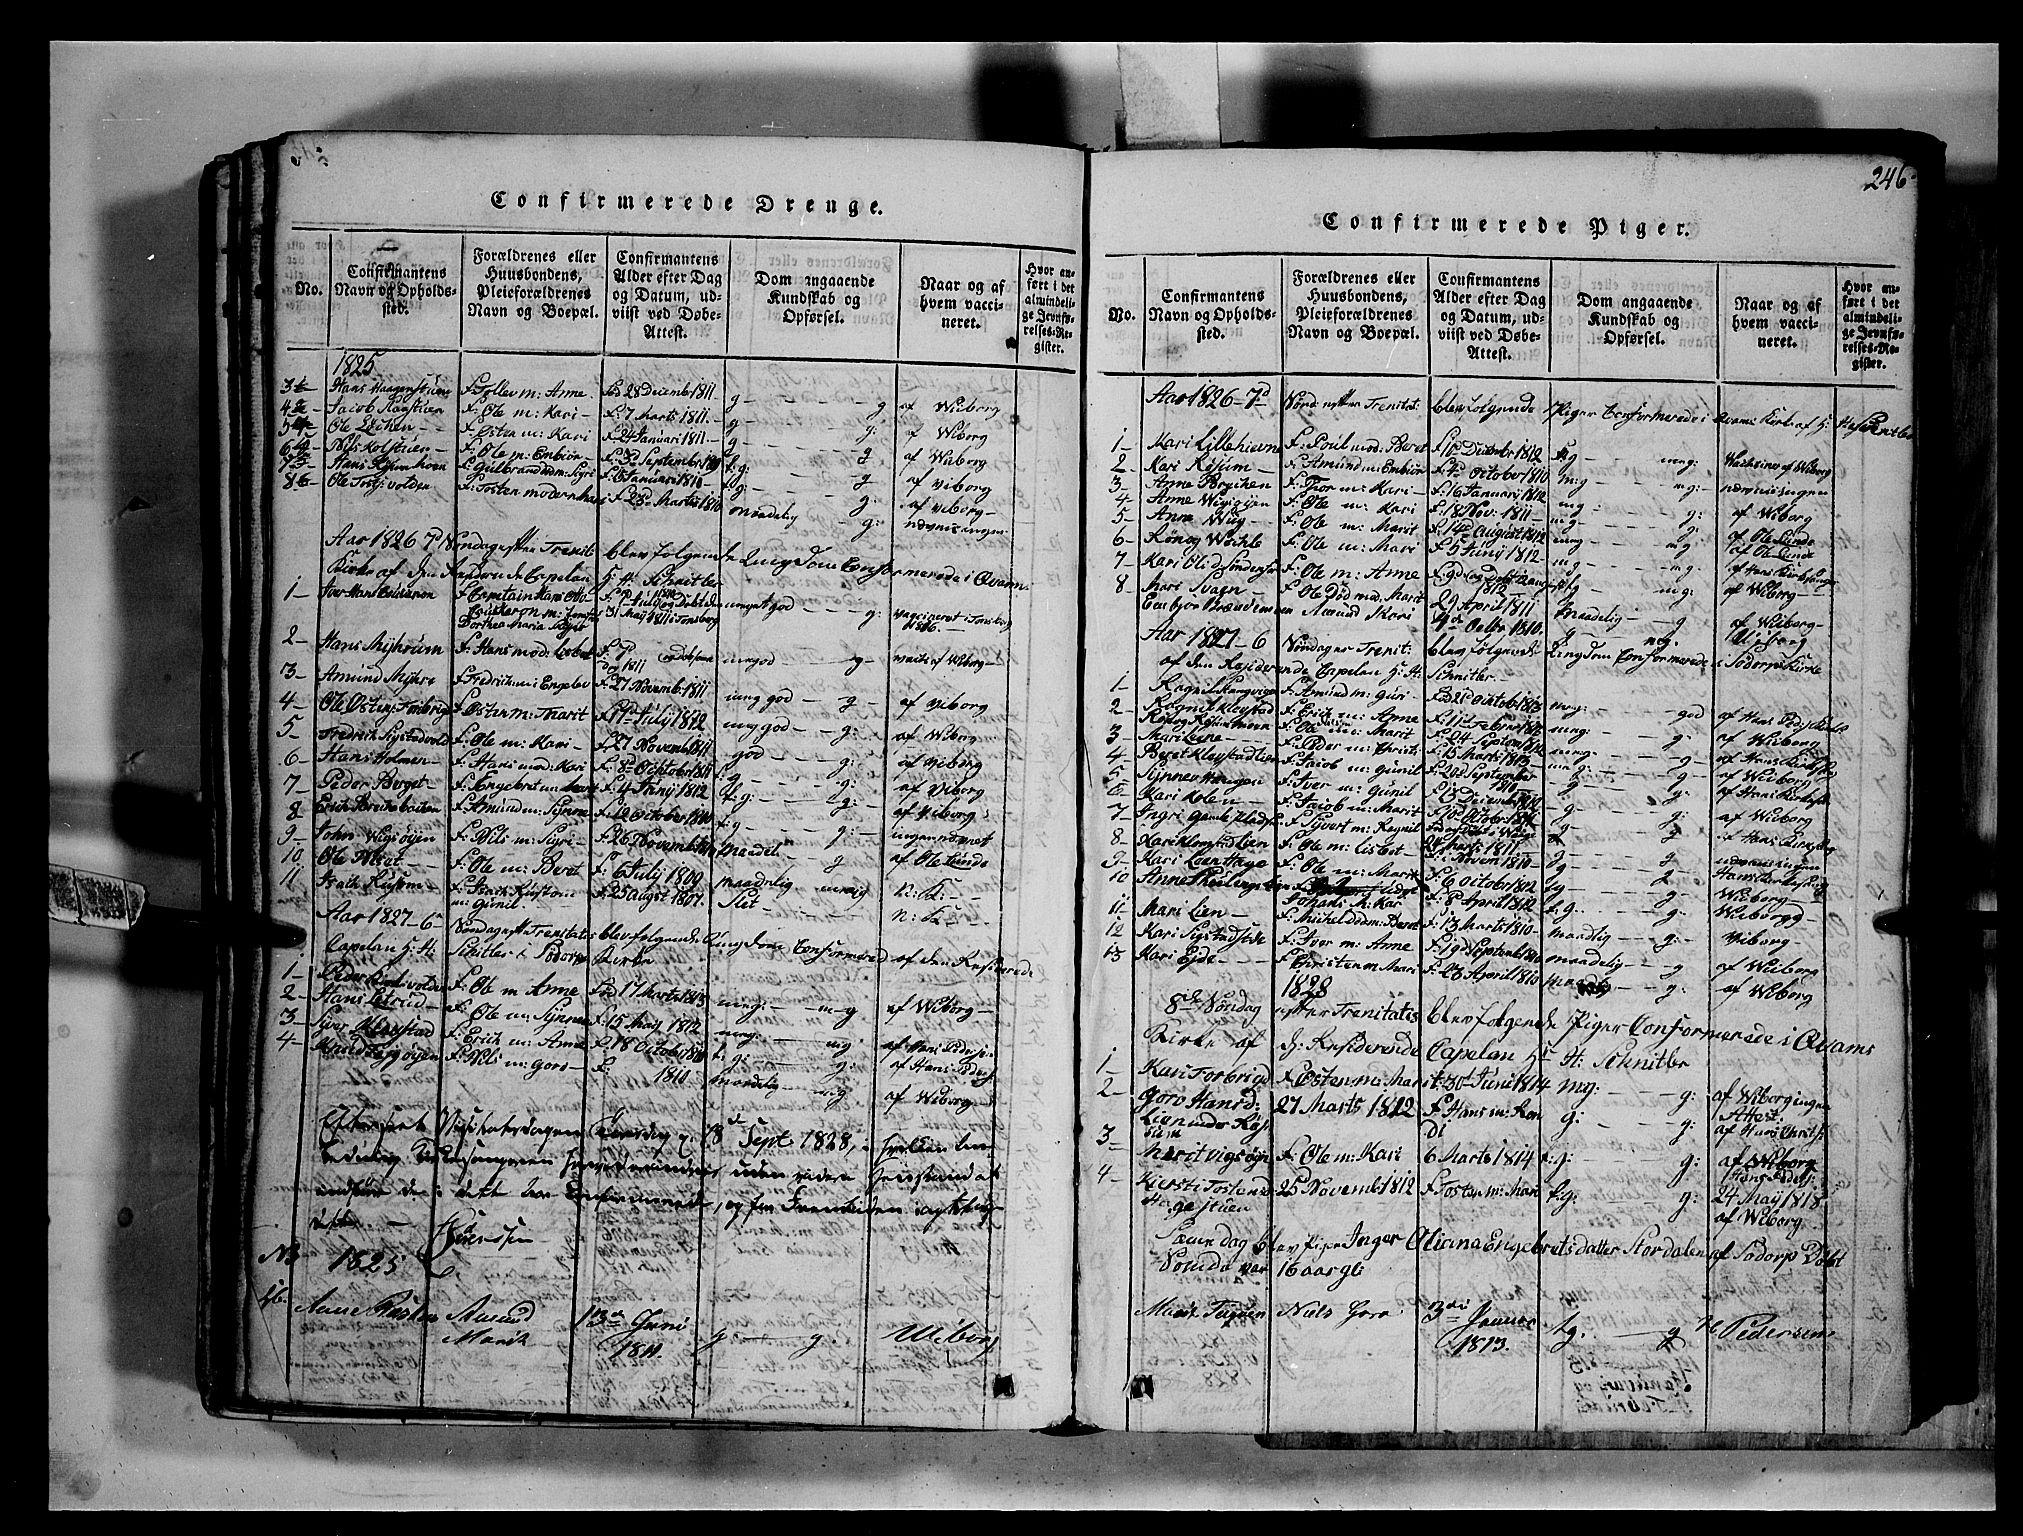 SAH, Fron prestekontor, H/Ha/Hab/L0002: Klokkerbok nr. 2, 1816-1850, s. 246